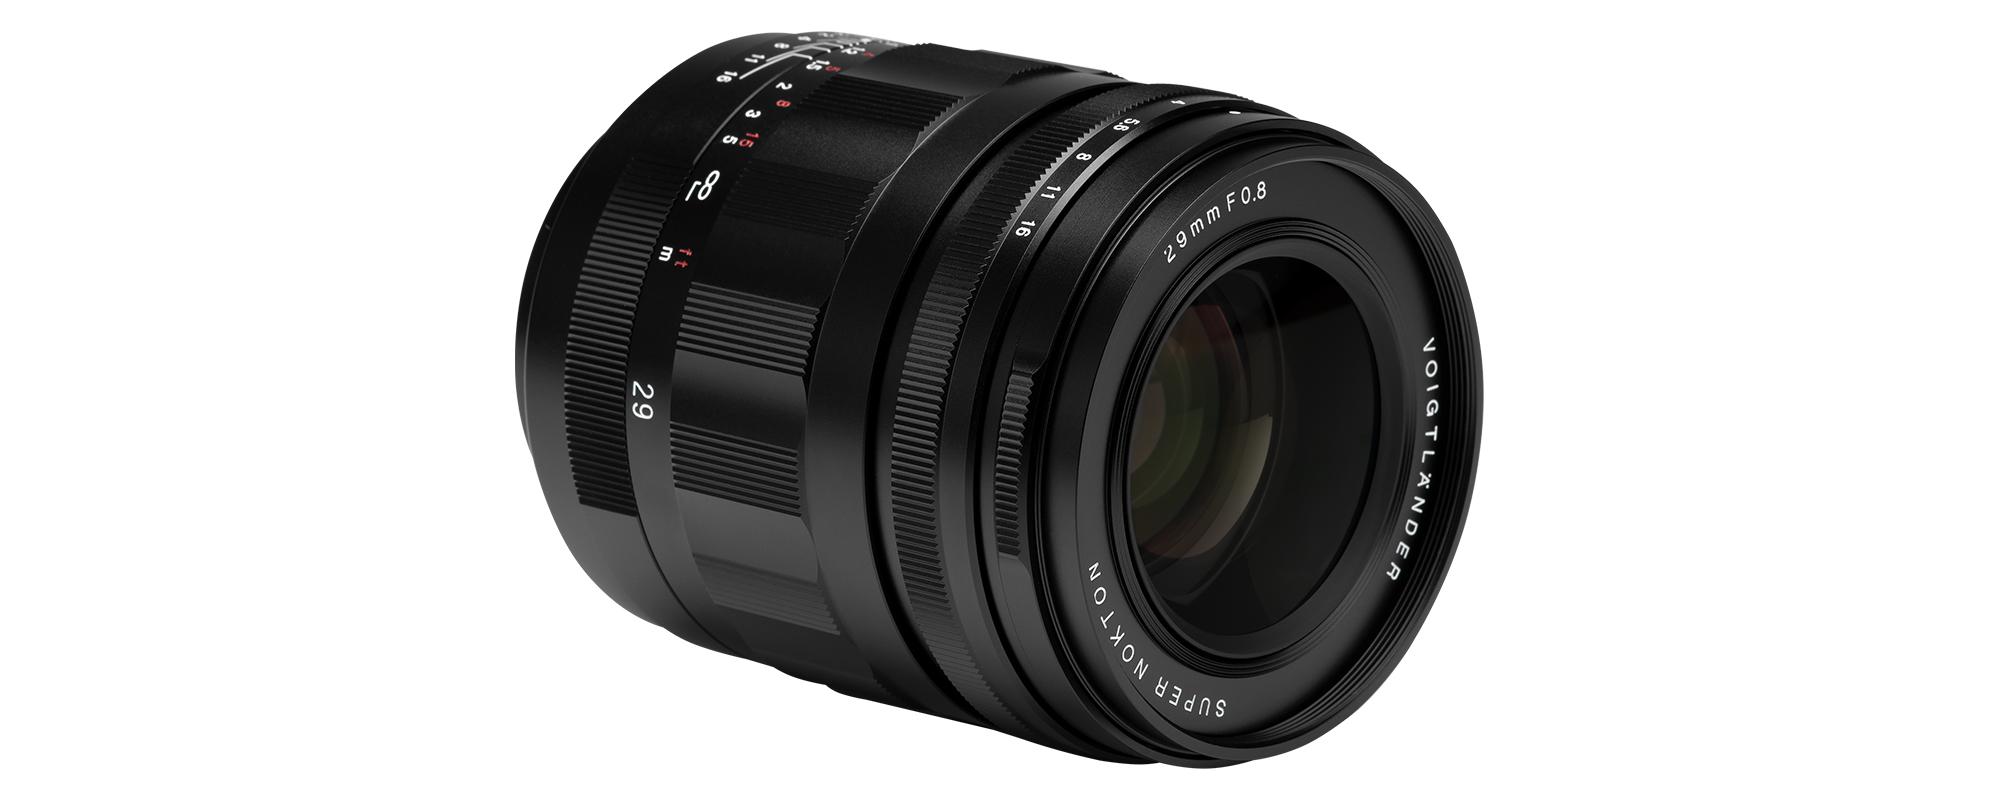 Voigtlander Super Nokton 29 mm f/0.8 lens for Micro 4/3 - solid workmanship